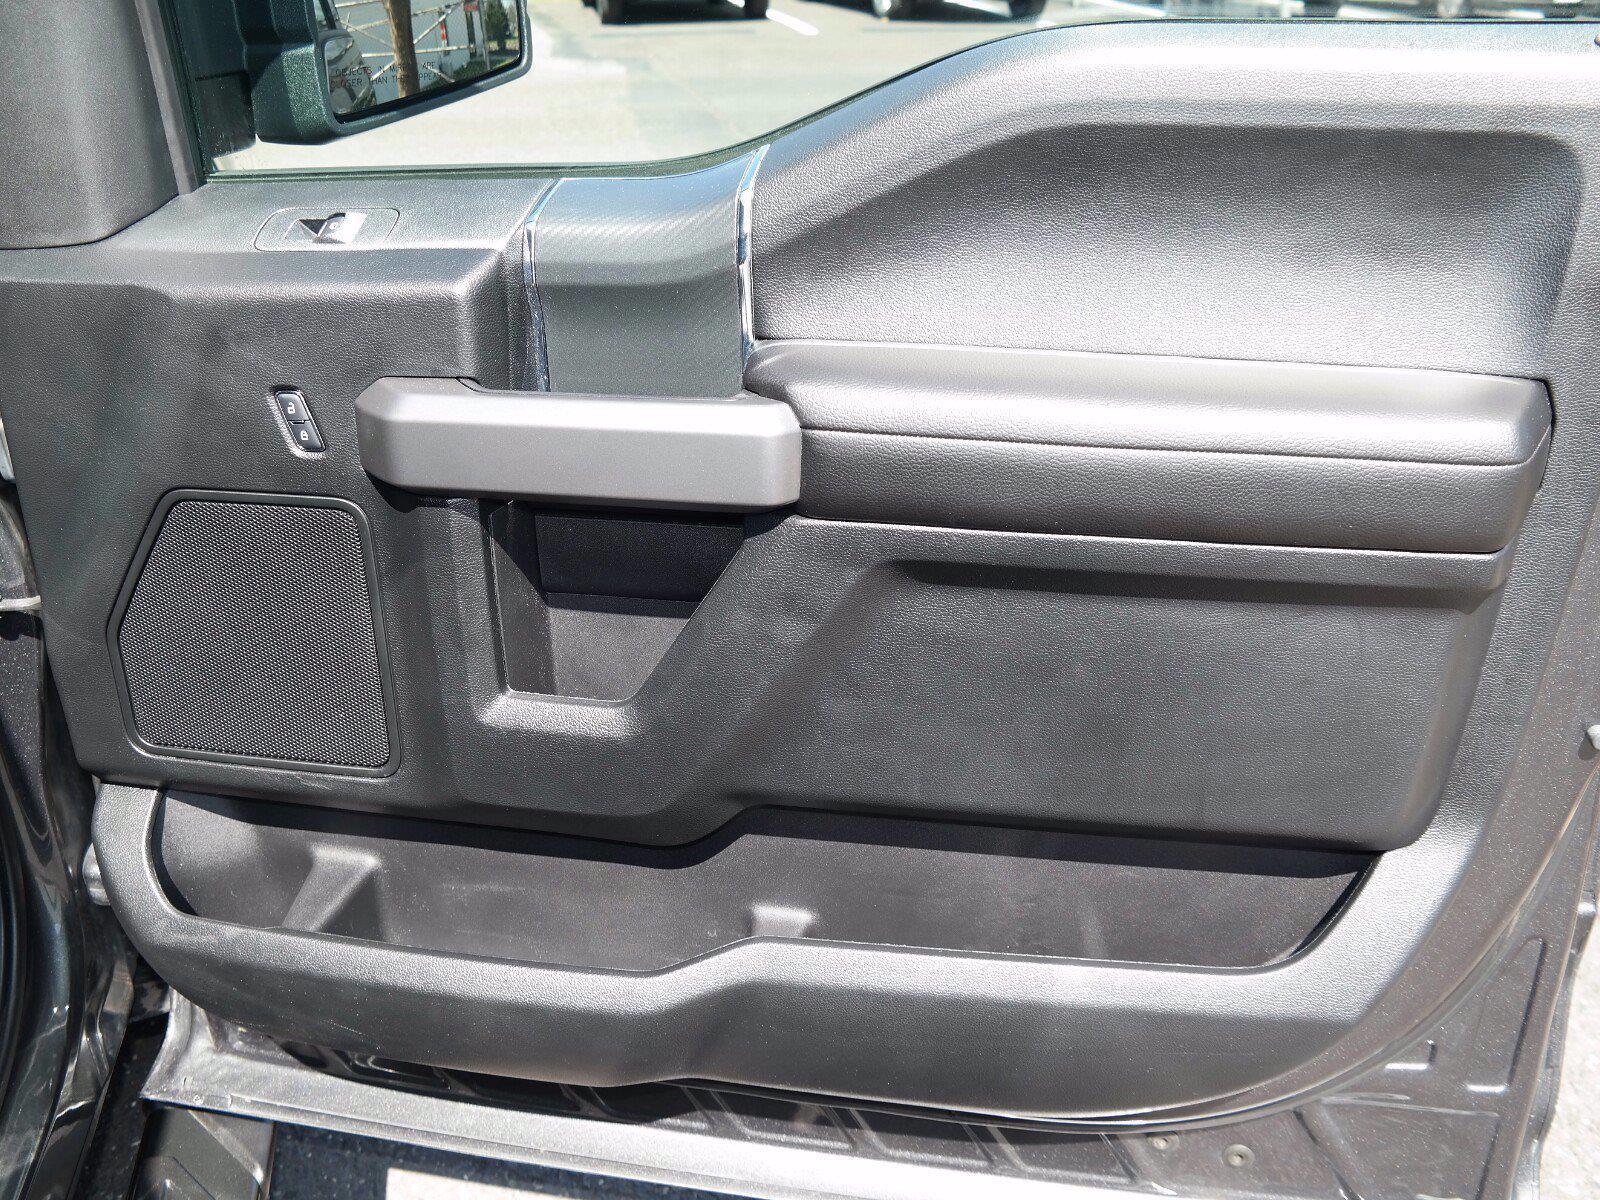 2018 Ford F-150 SuperCrew Cab 4x4, Pickup #FL100891 - photo 30